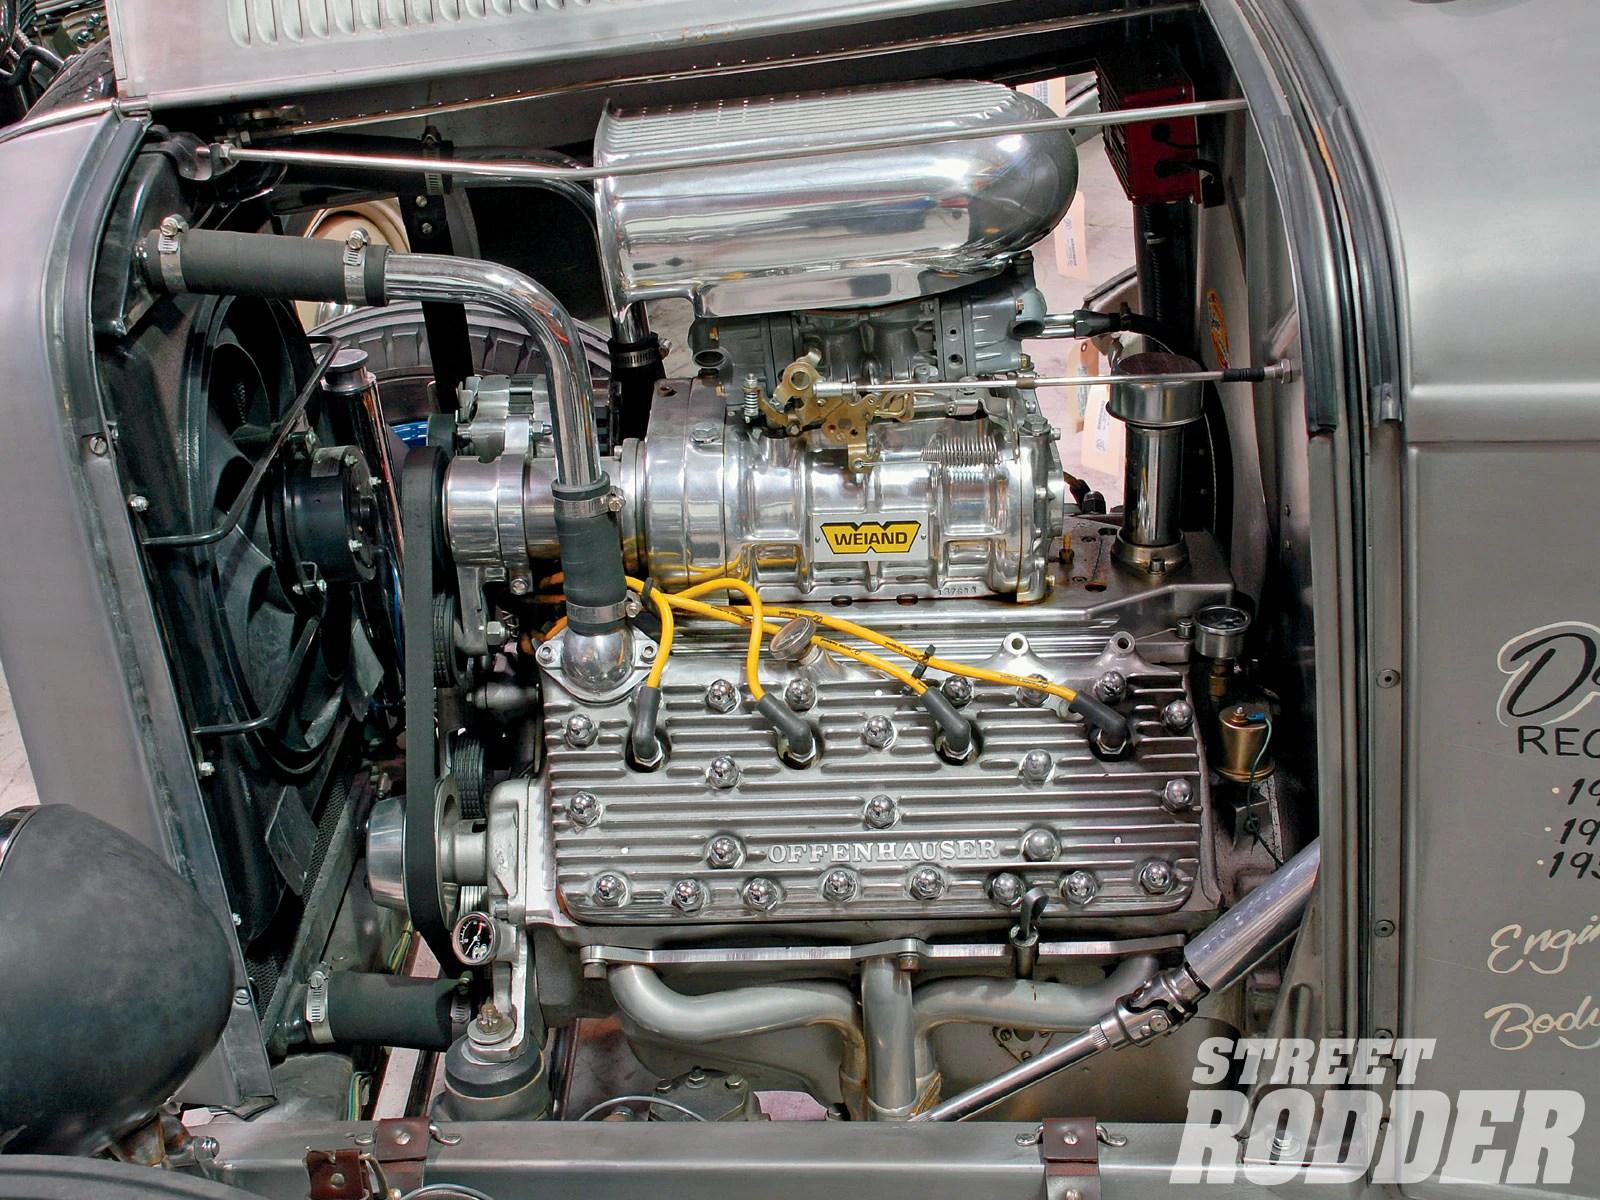 medium resolution of flathead ford engines internal diagrams wiring diagram database flathead ford engines internal diagrams